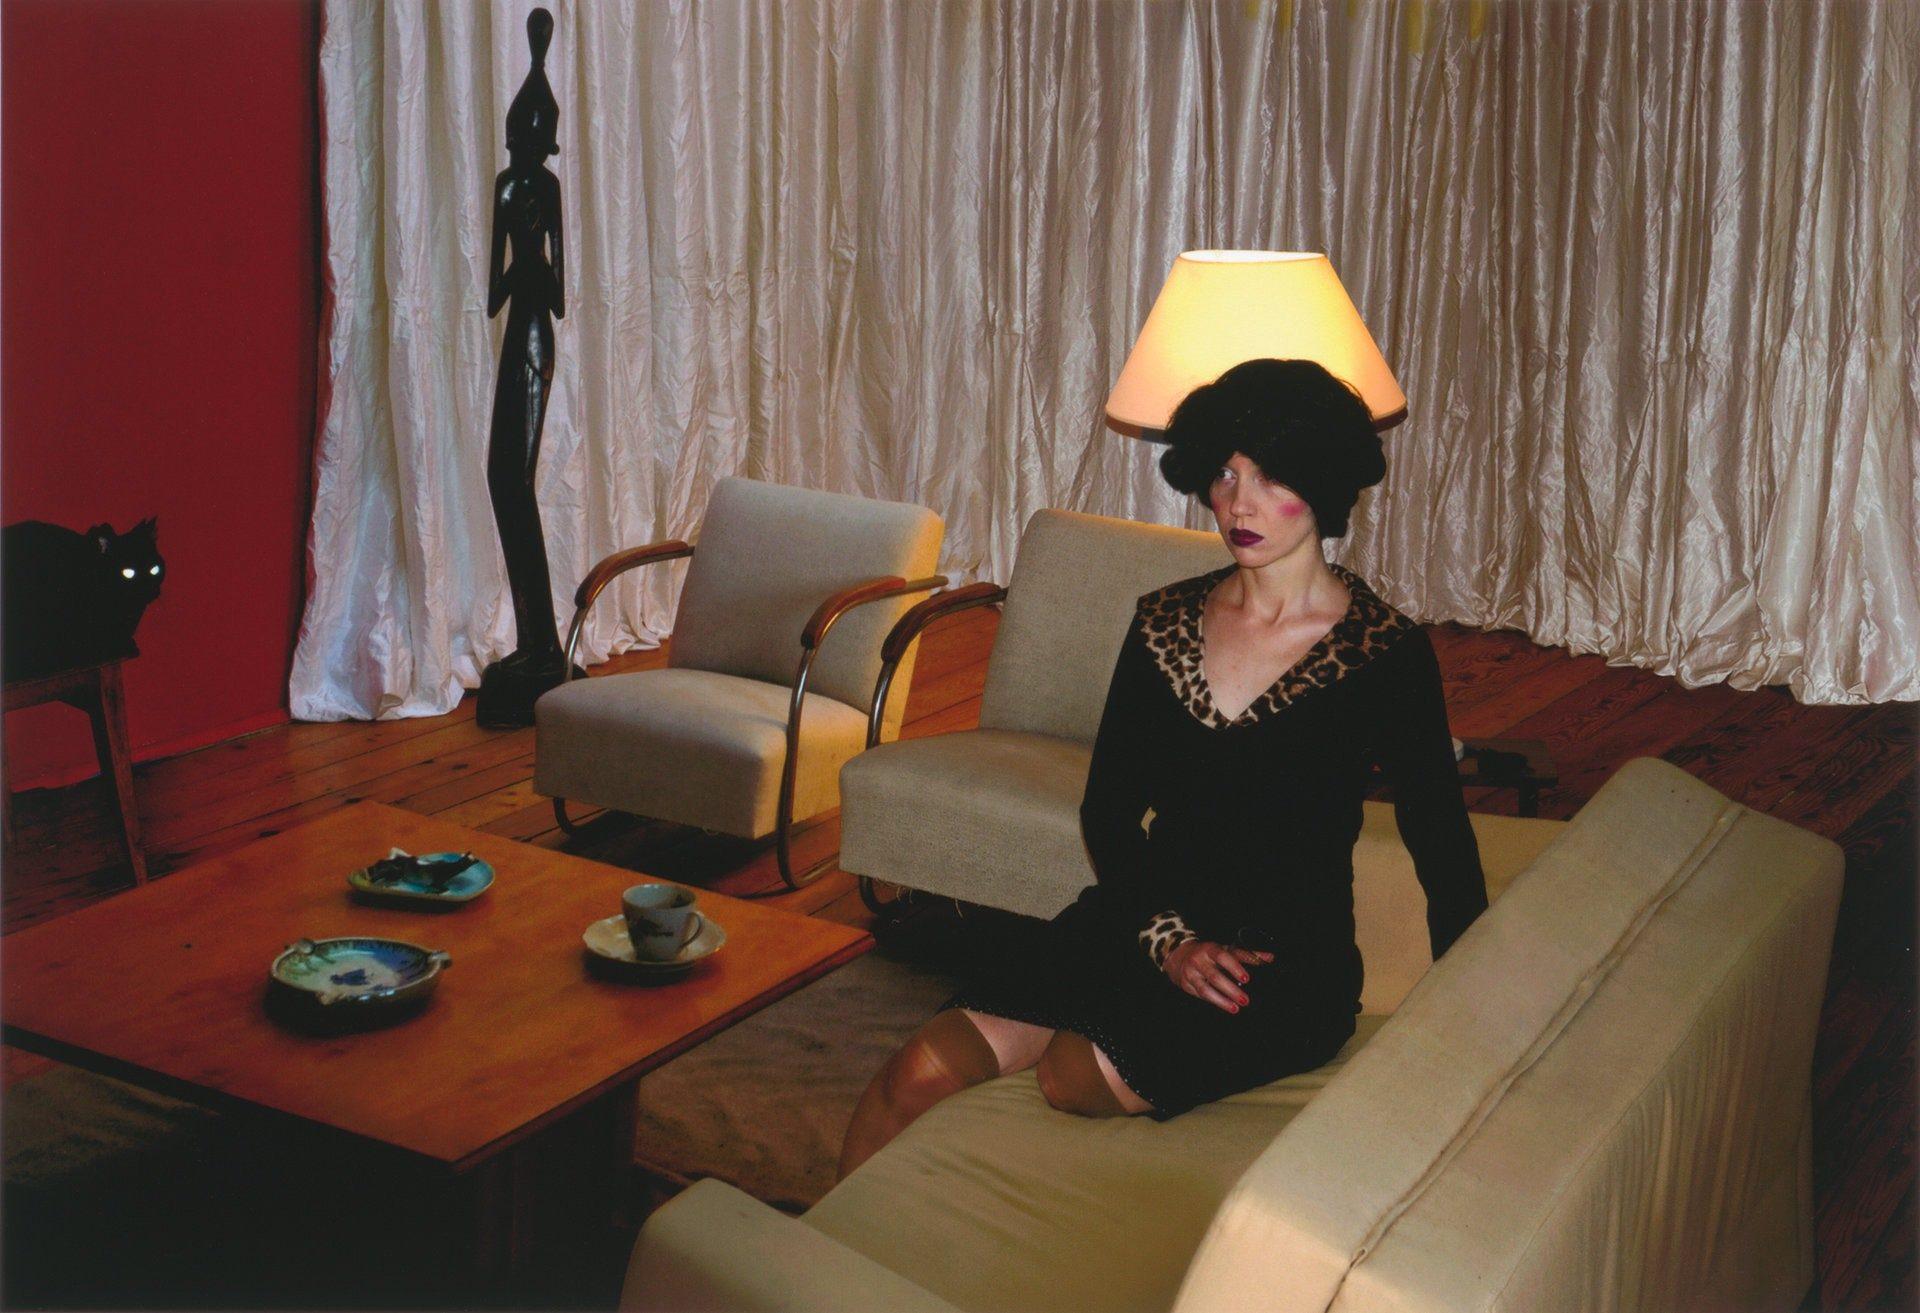 Aneta Grzeszykowska, Untitled Film Stills #50, 2006